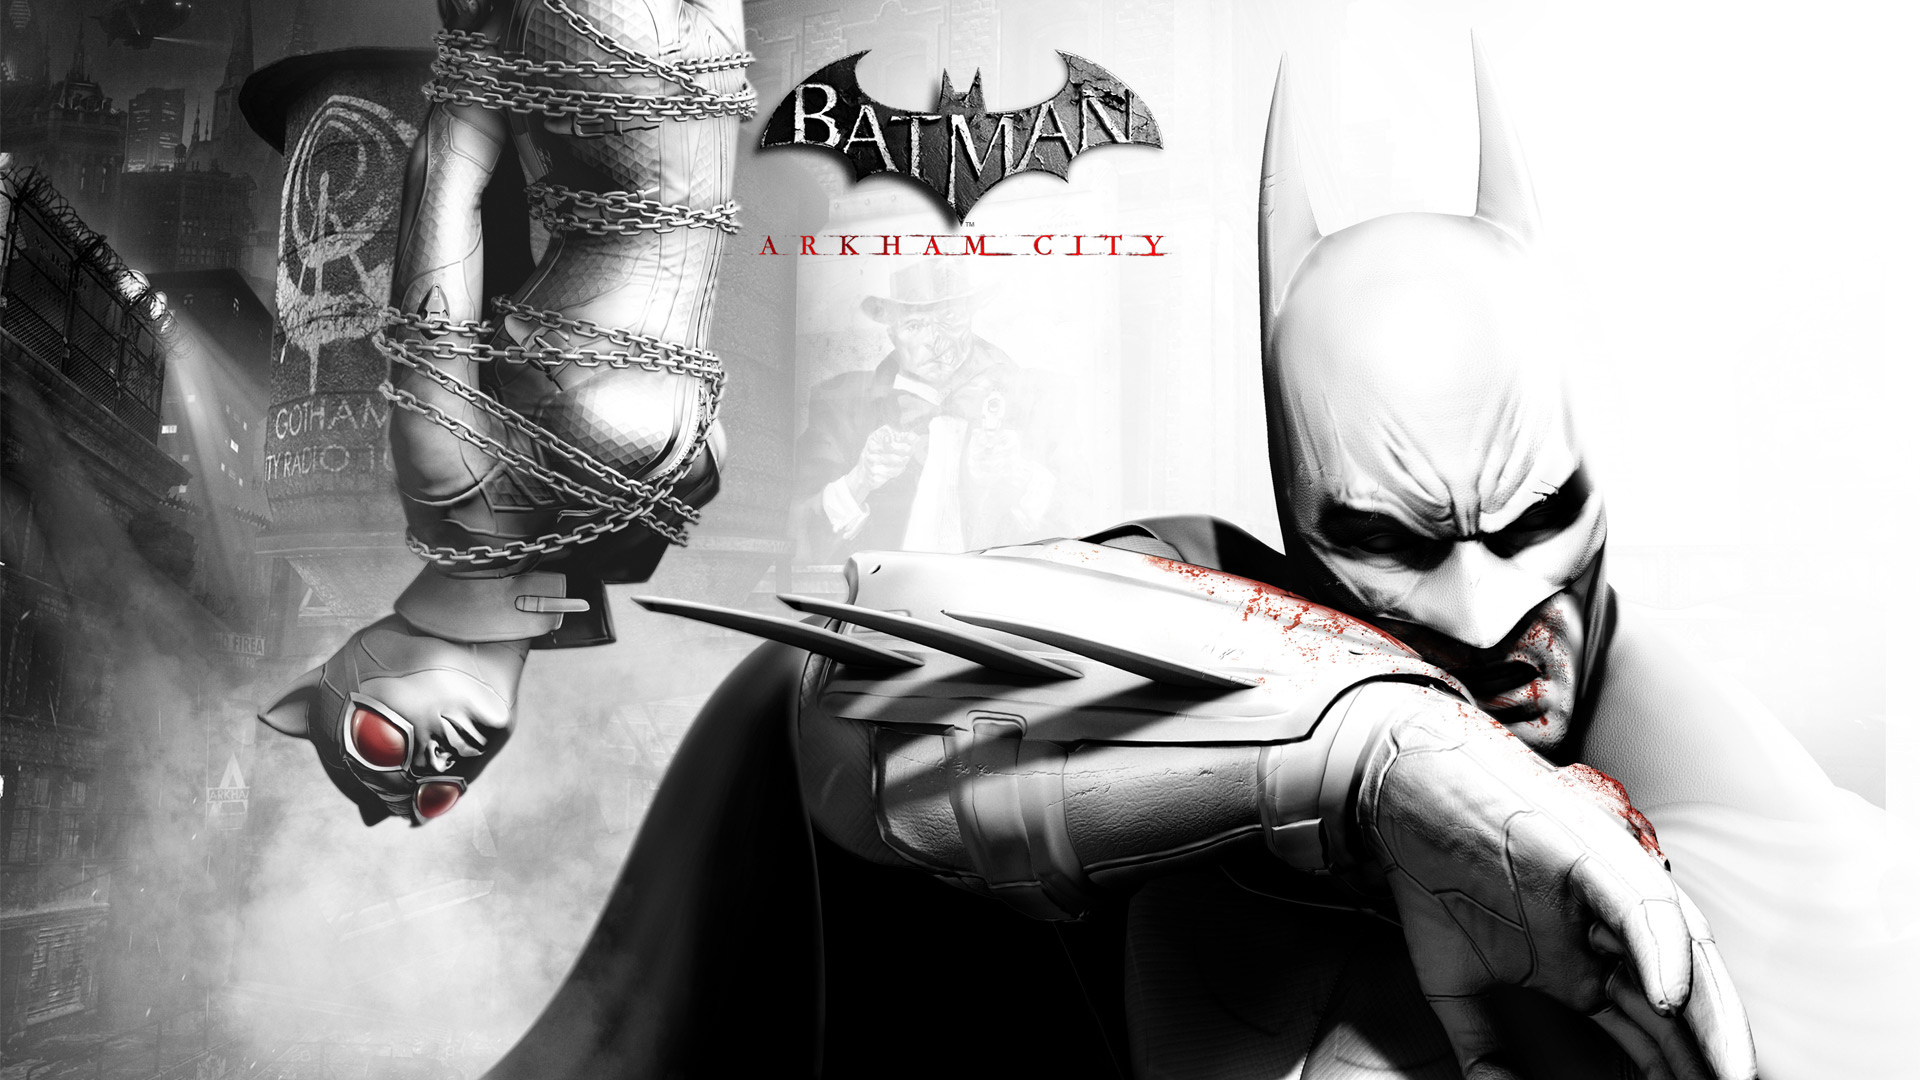 Hd wallpaper games -  Amazing Game Wallpaper 1 Batman_arkham_city_video_game Hd